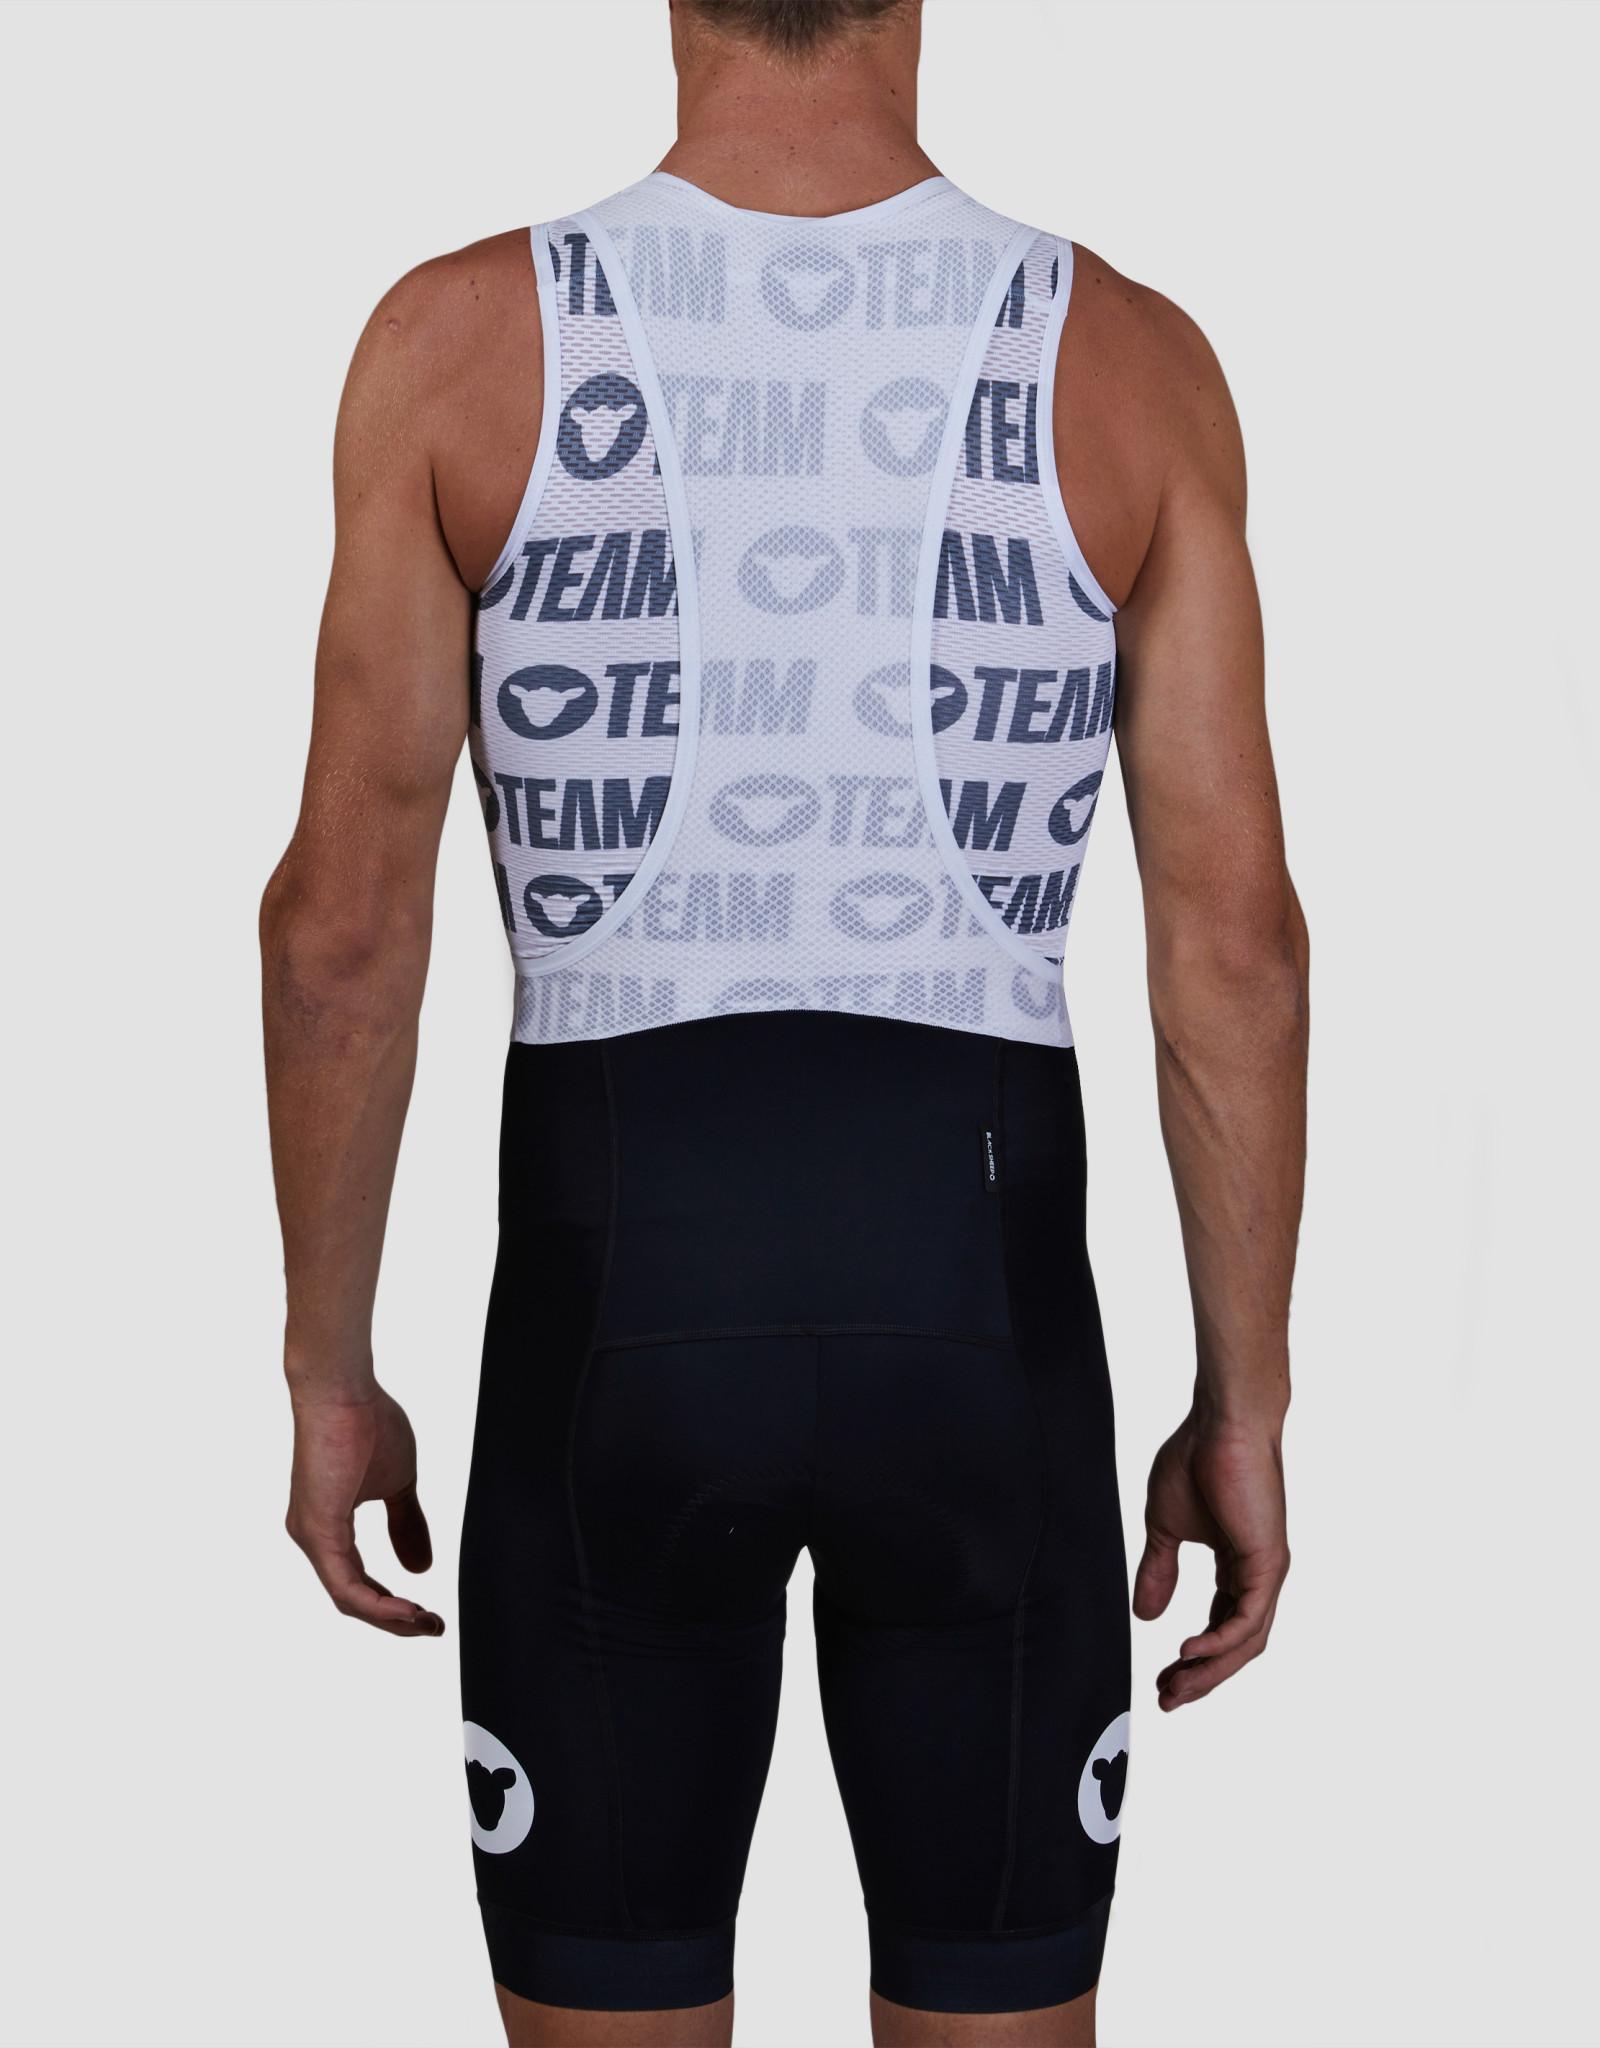 Black Sheep Cycling Men's Essentials TEAM broek - zwart